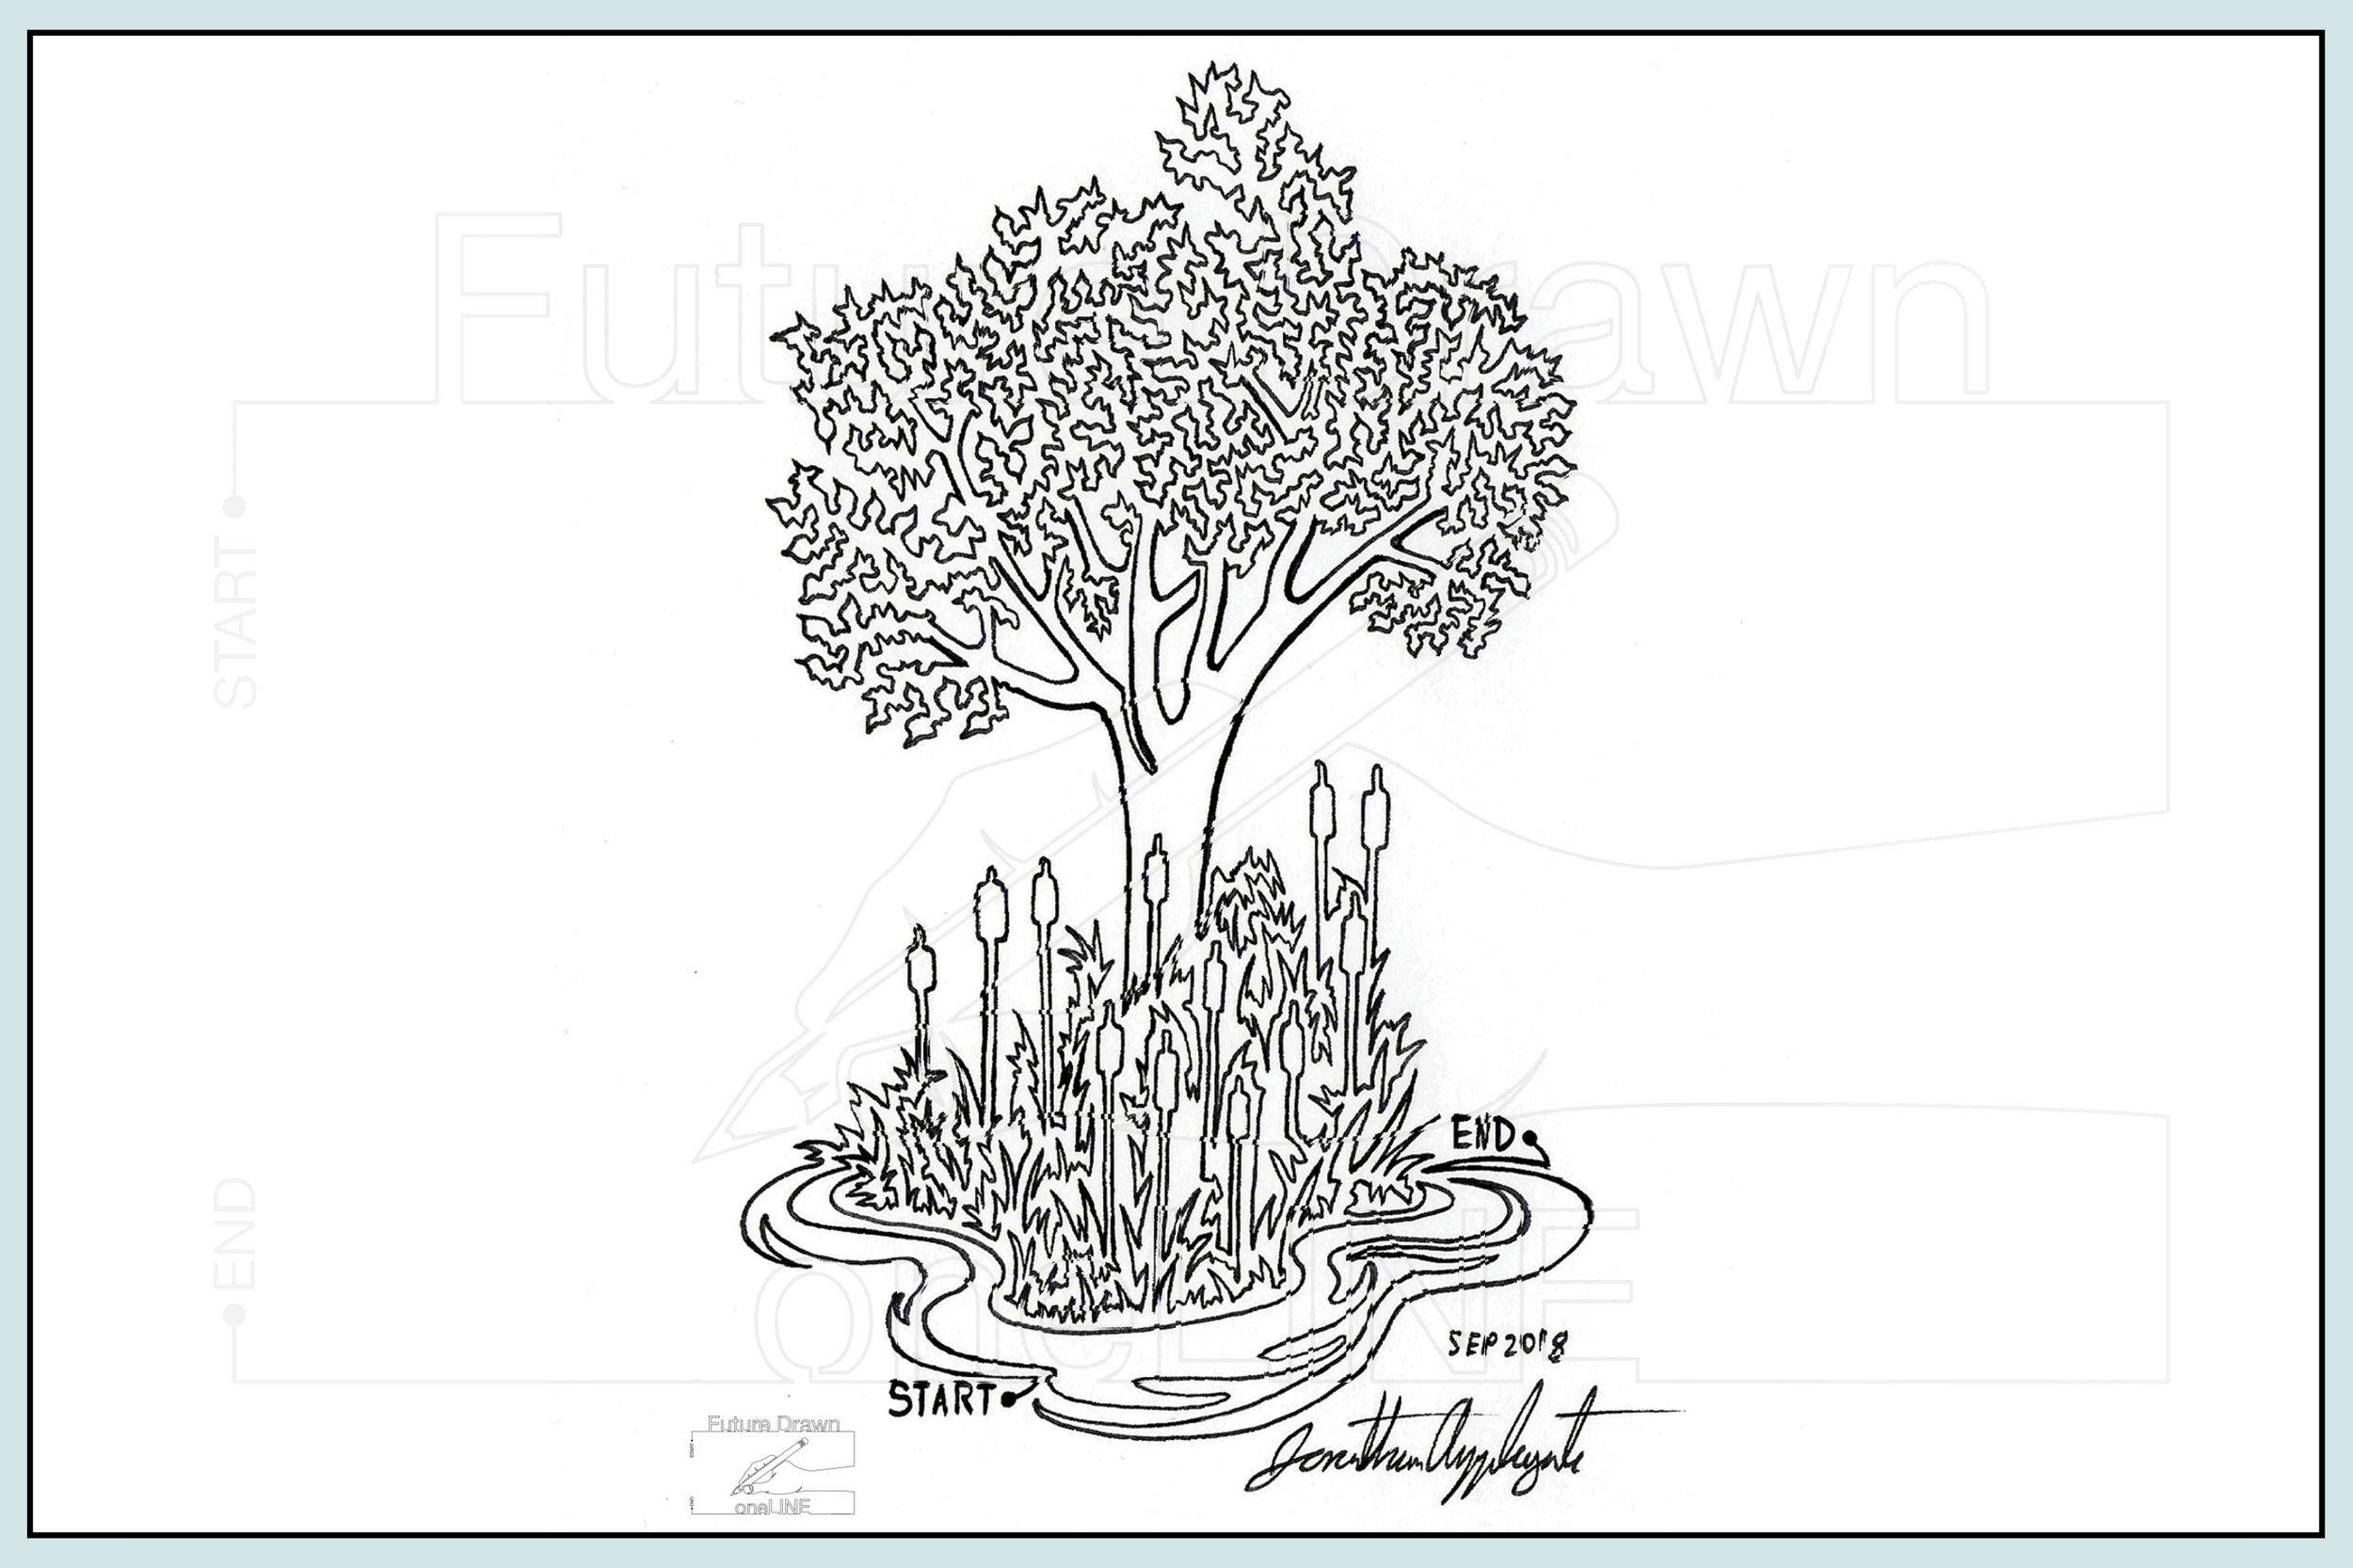 Web- Cattails and tree- oneLINE Future Drawn Applegate.jpg